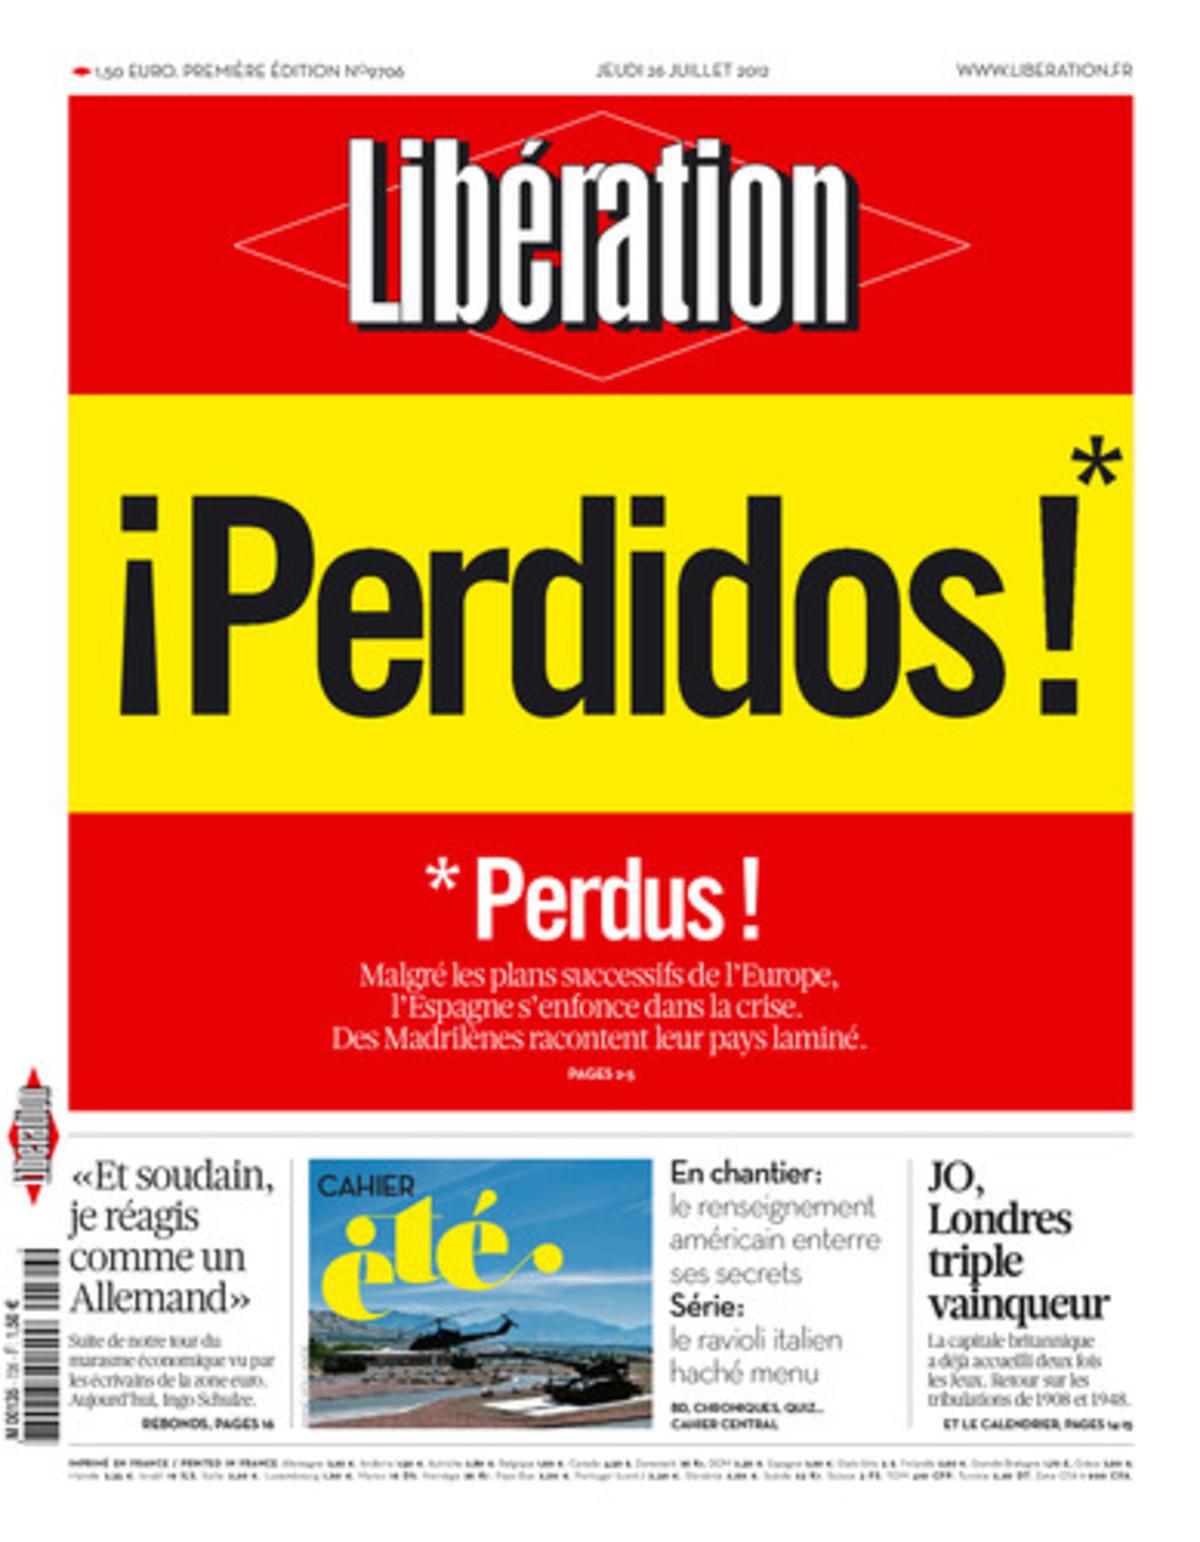 LIBERATION: Μετά το ΧΑΟΣ στο !PERDIDOS! | Newsit.gr